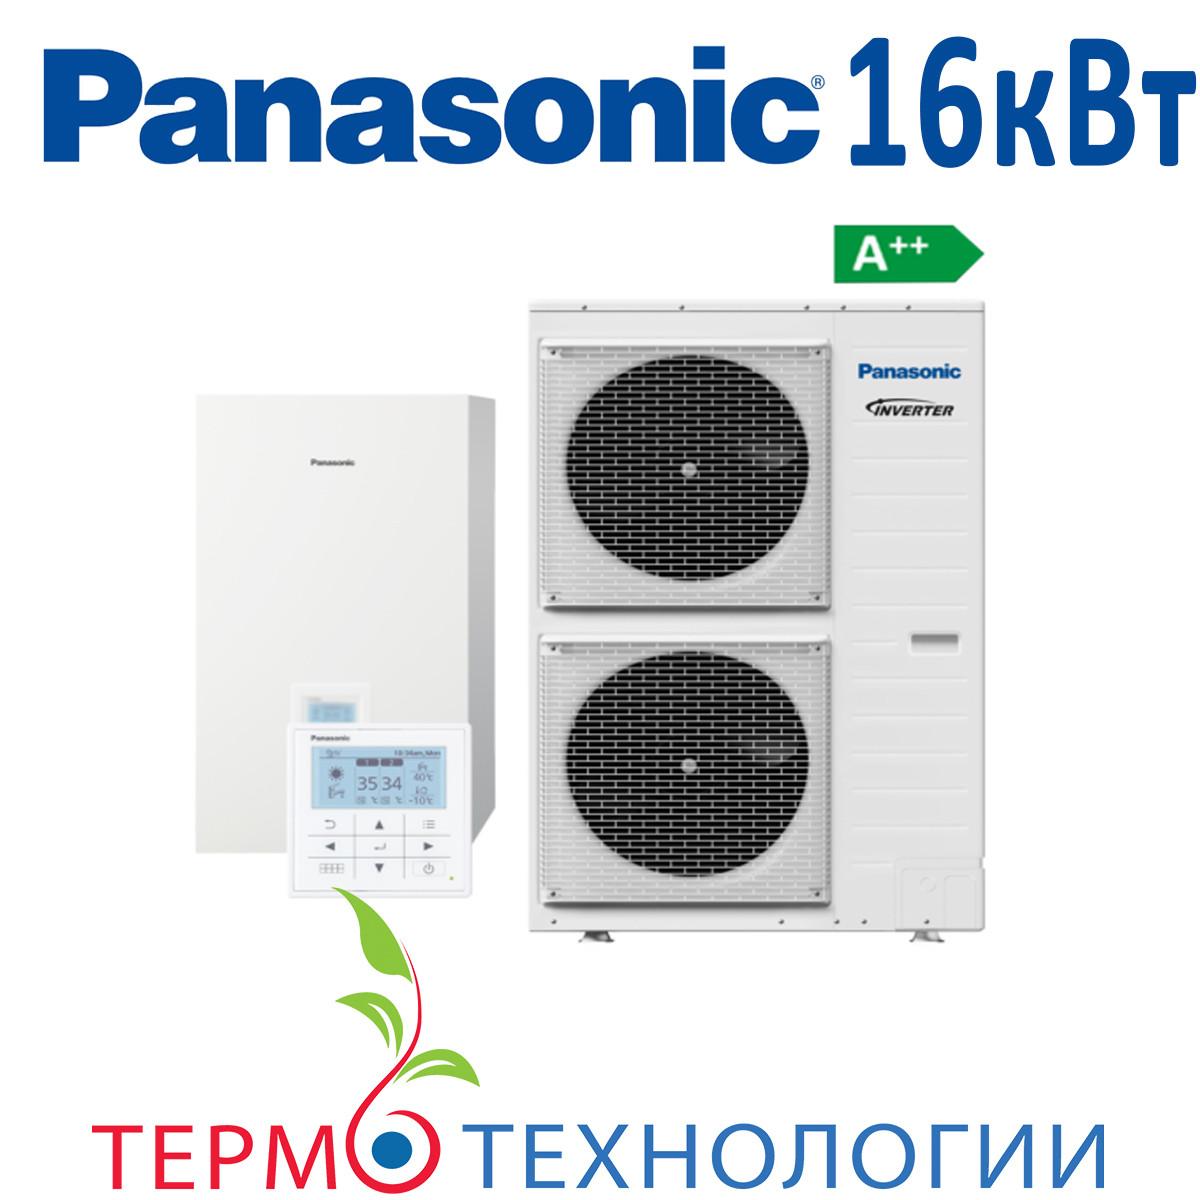 Тепловой насос воздух-вода Panasonic 16 кВт HP с гидромодулем